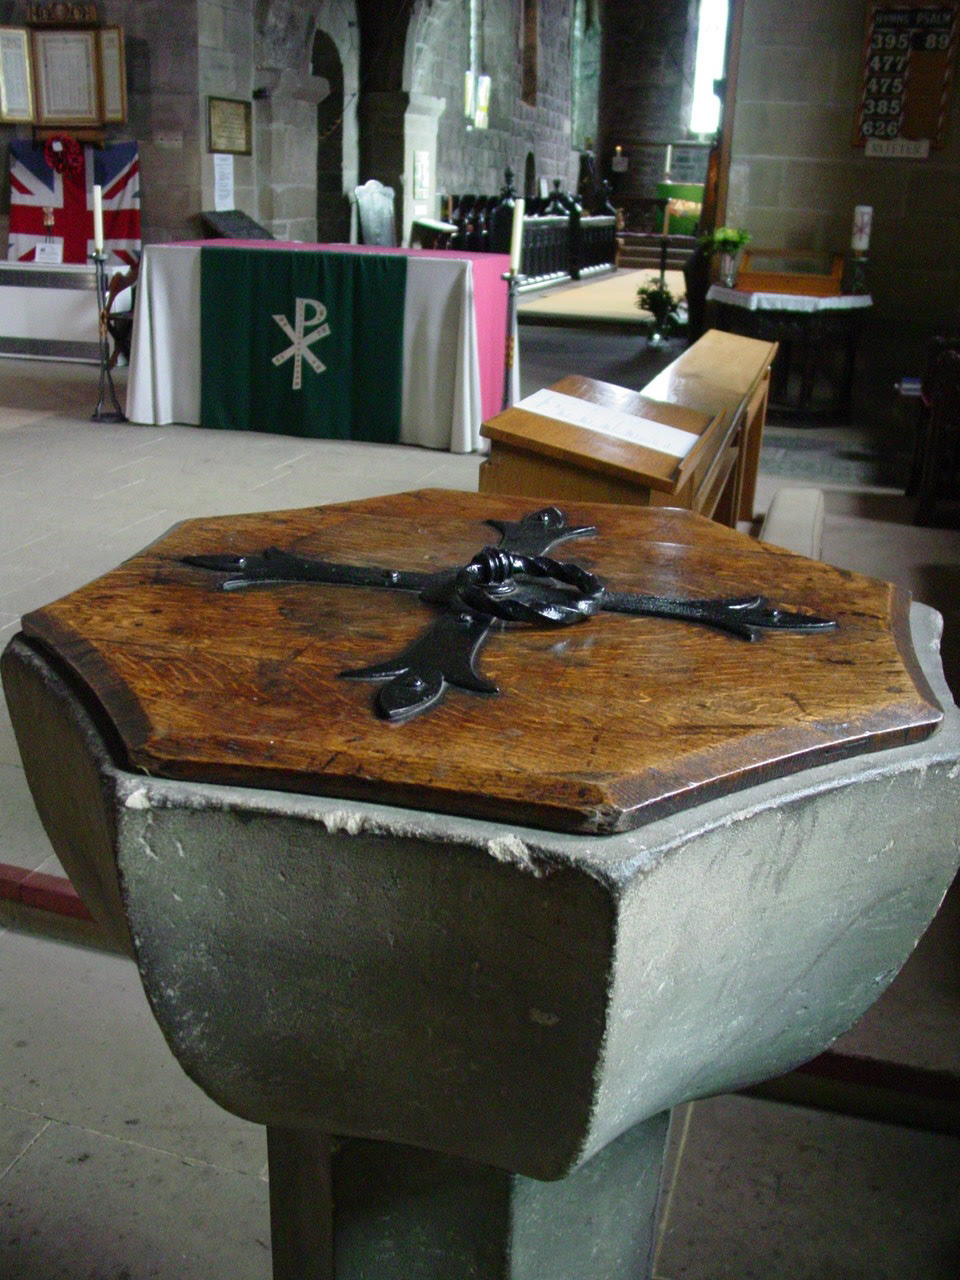 Baptismal font at St Paul's, Jarrow